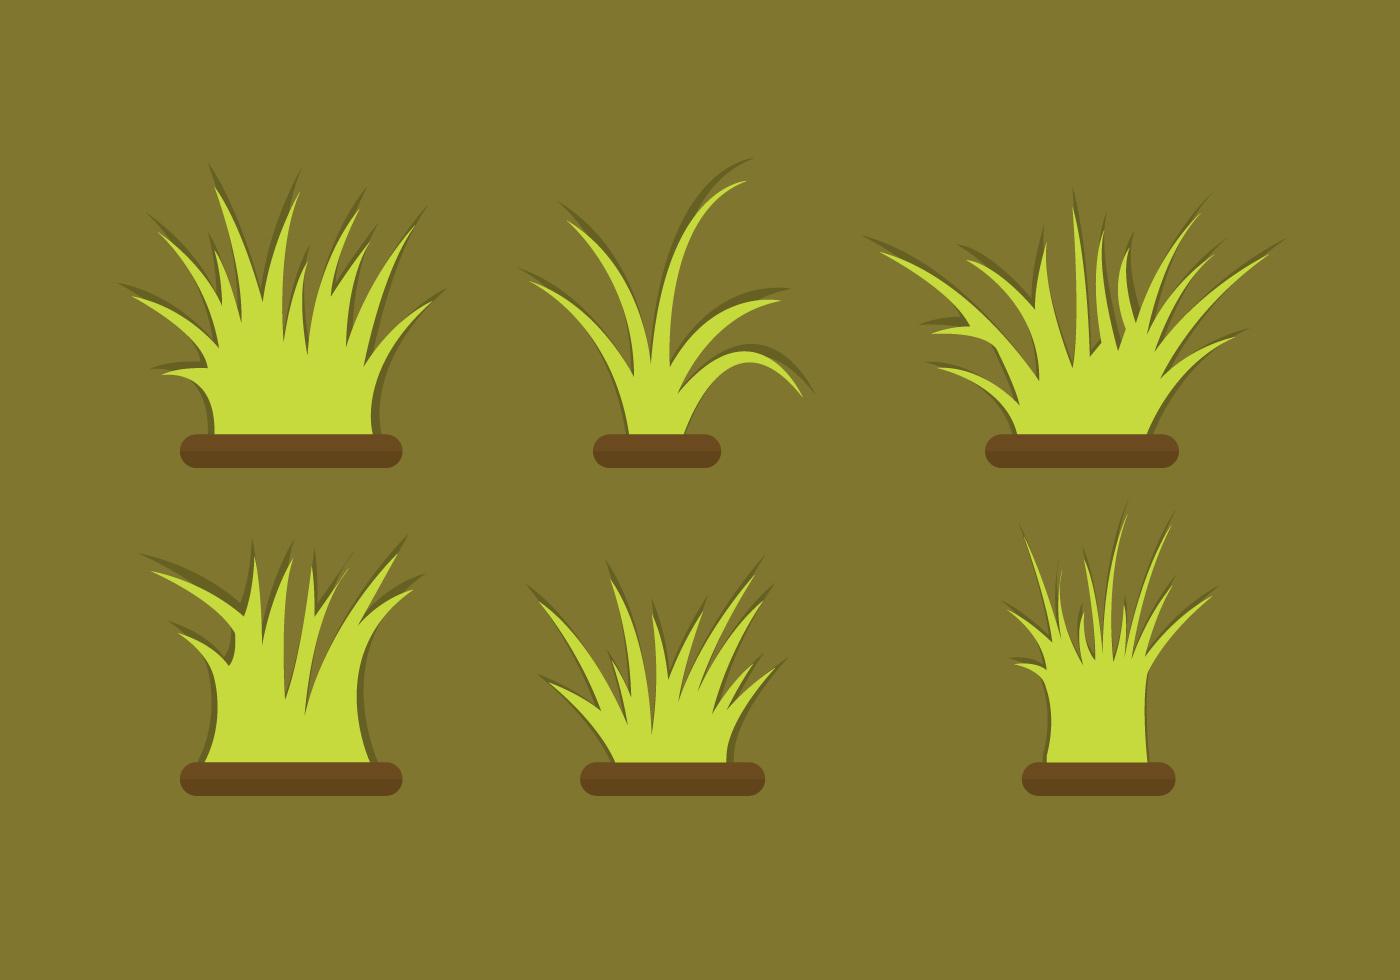 free vector clipart grass - photo #16